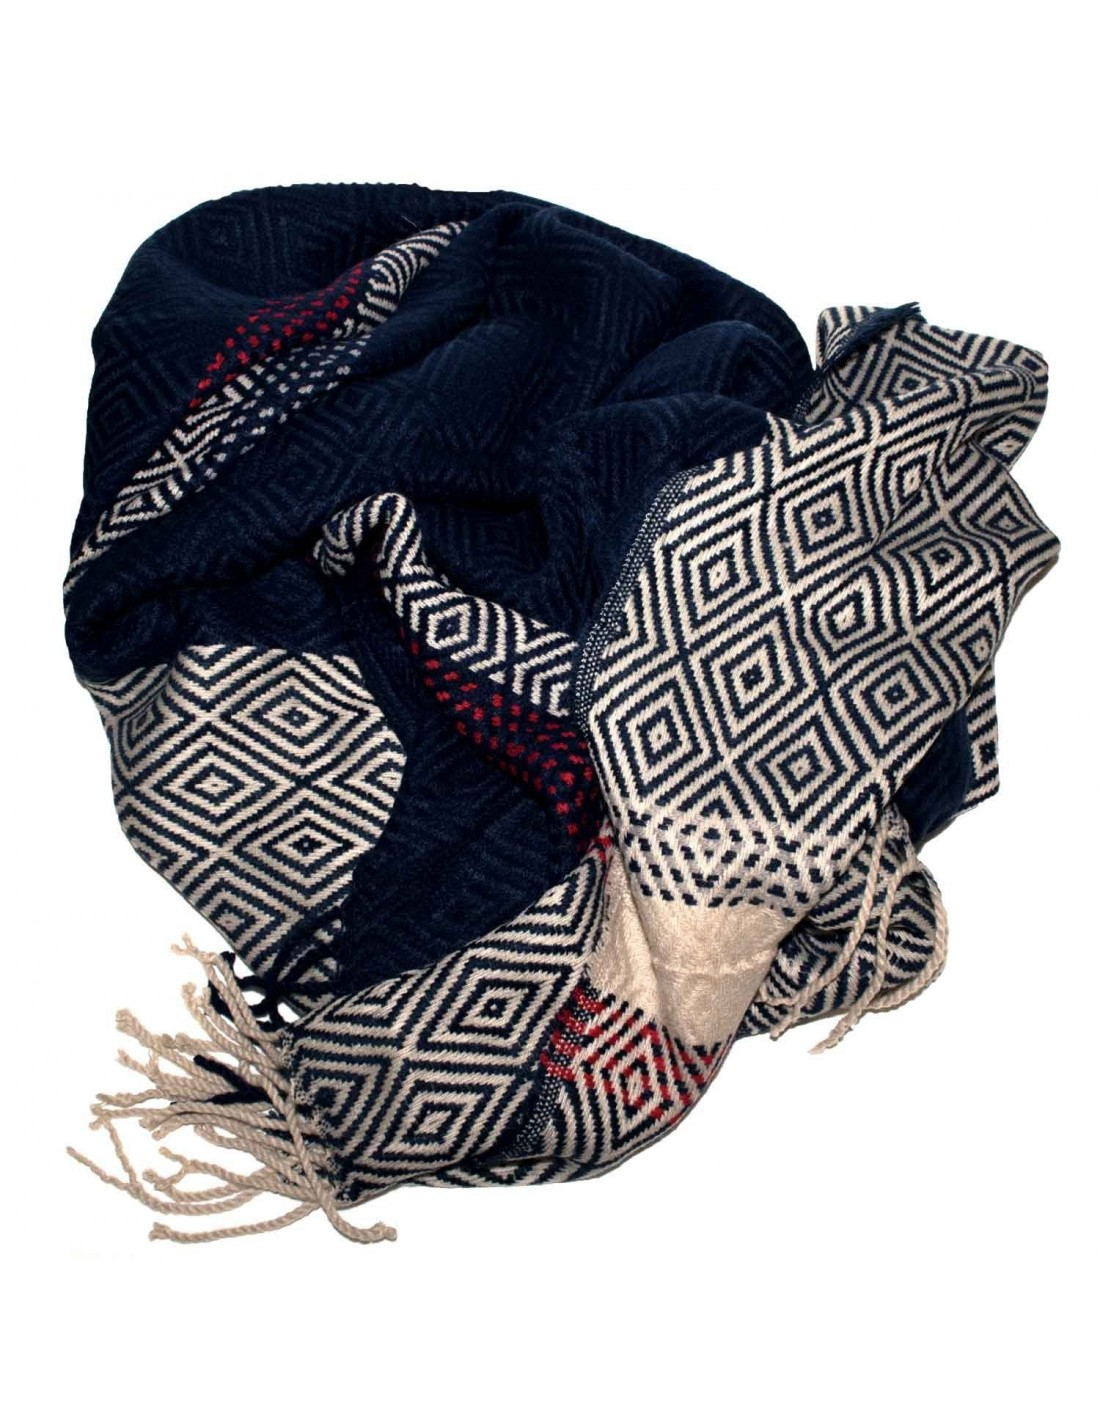 Grande echarpe douce femme - Idée pour s habiller da31d044d039